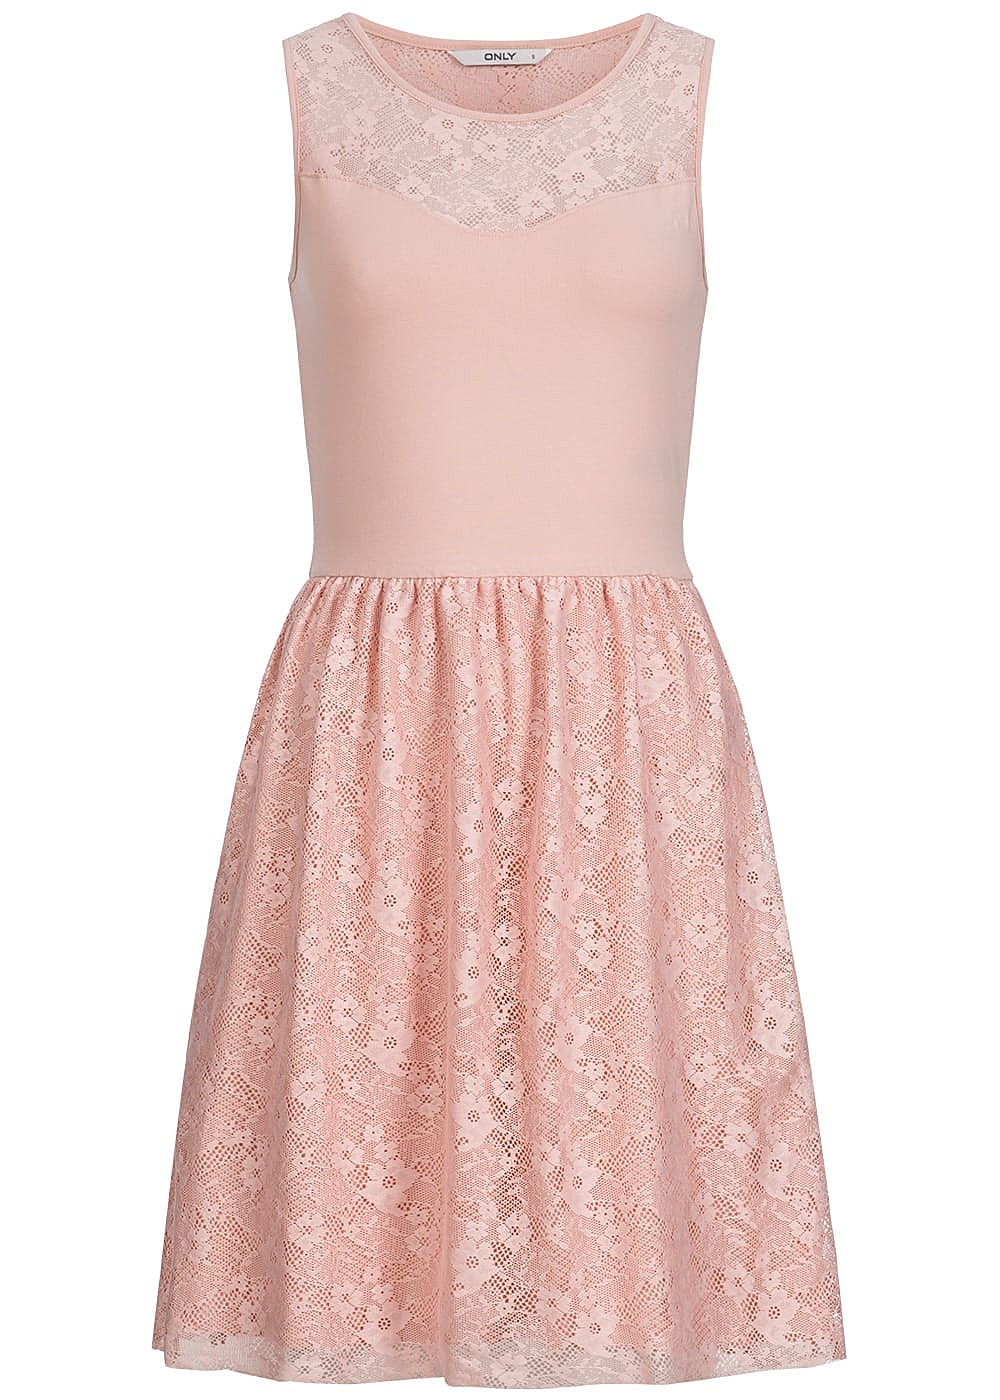 ONLY Damen Midi Kleid 2-lagig Spitze peach whip rosa - 77onlineshop